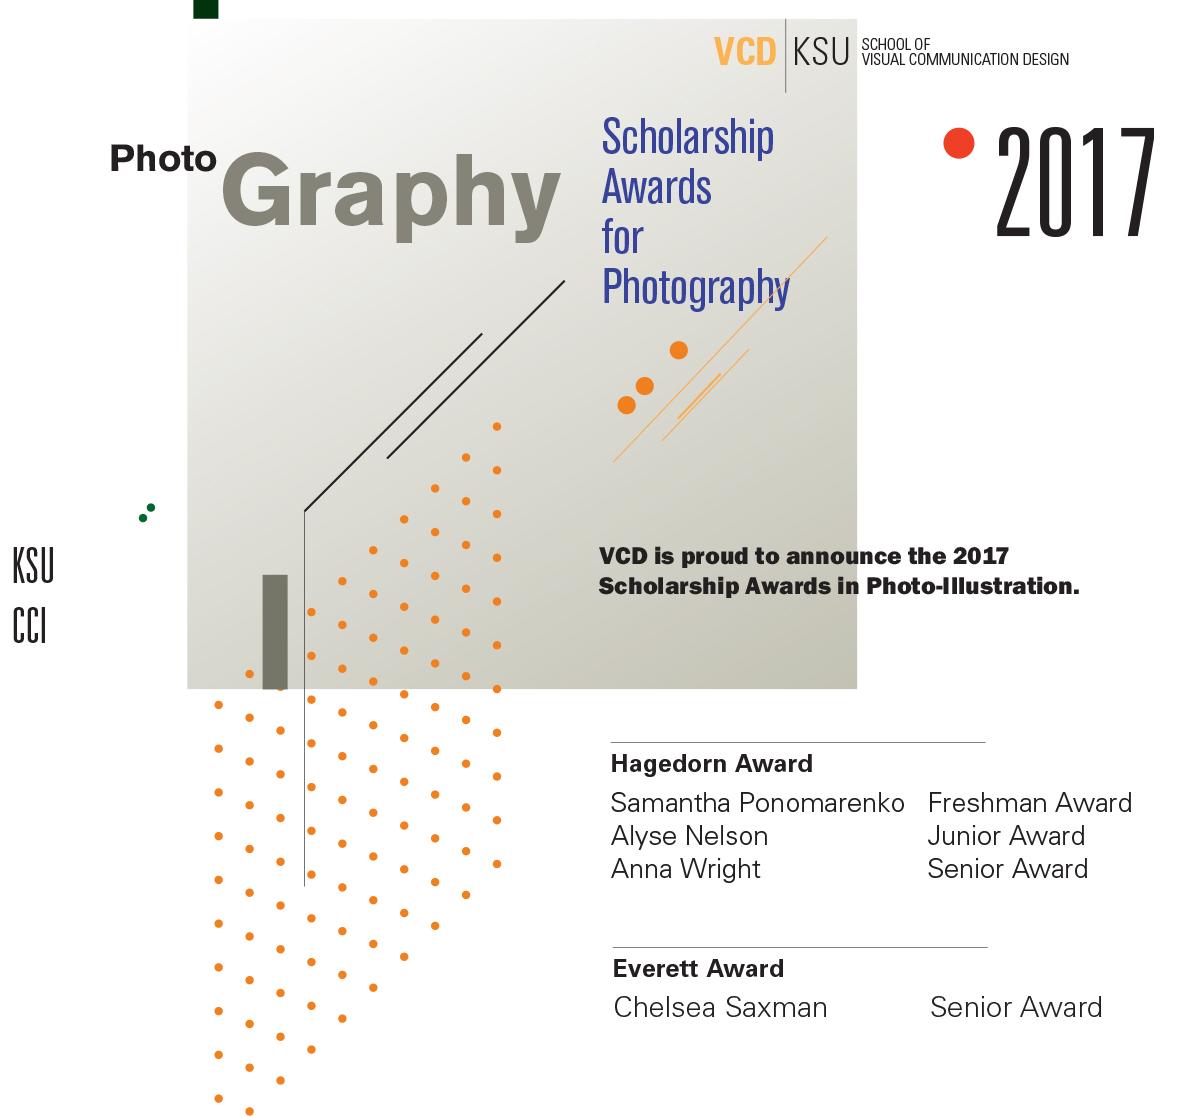 2017 Photography Scholarship Awards